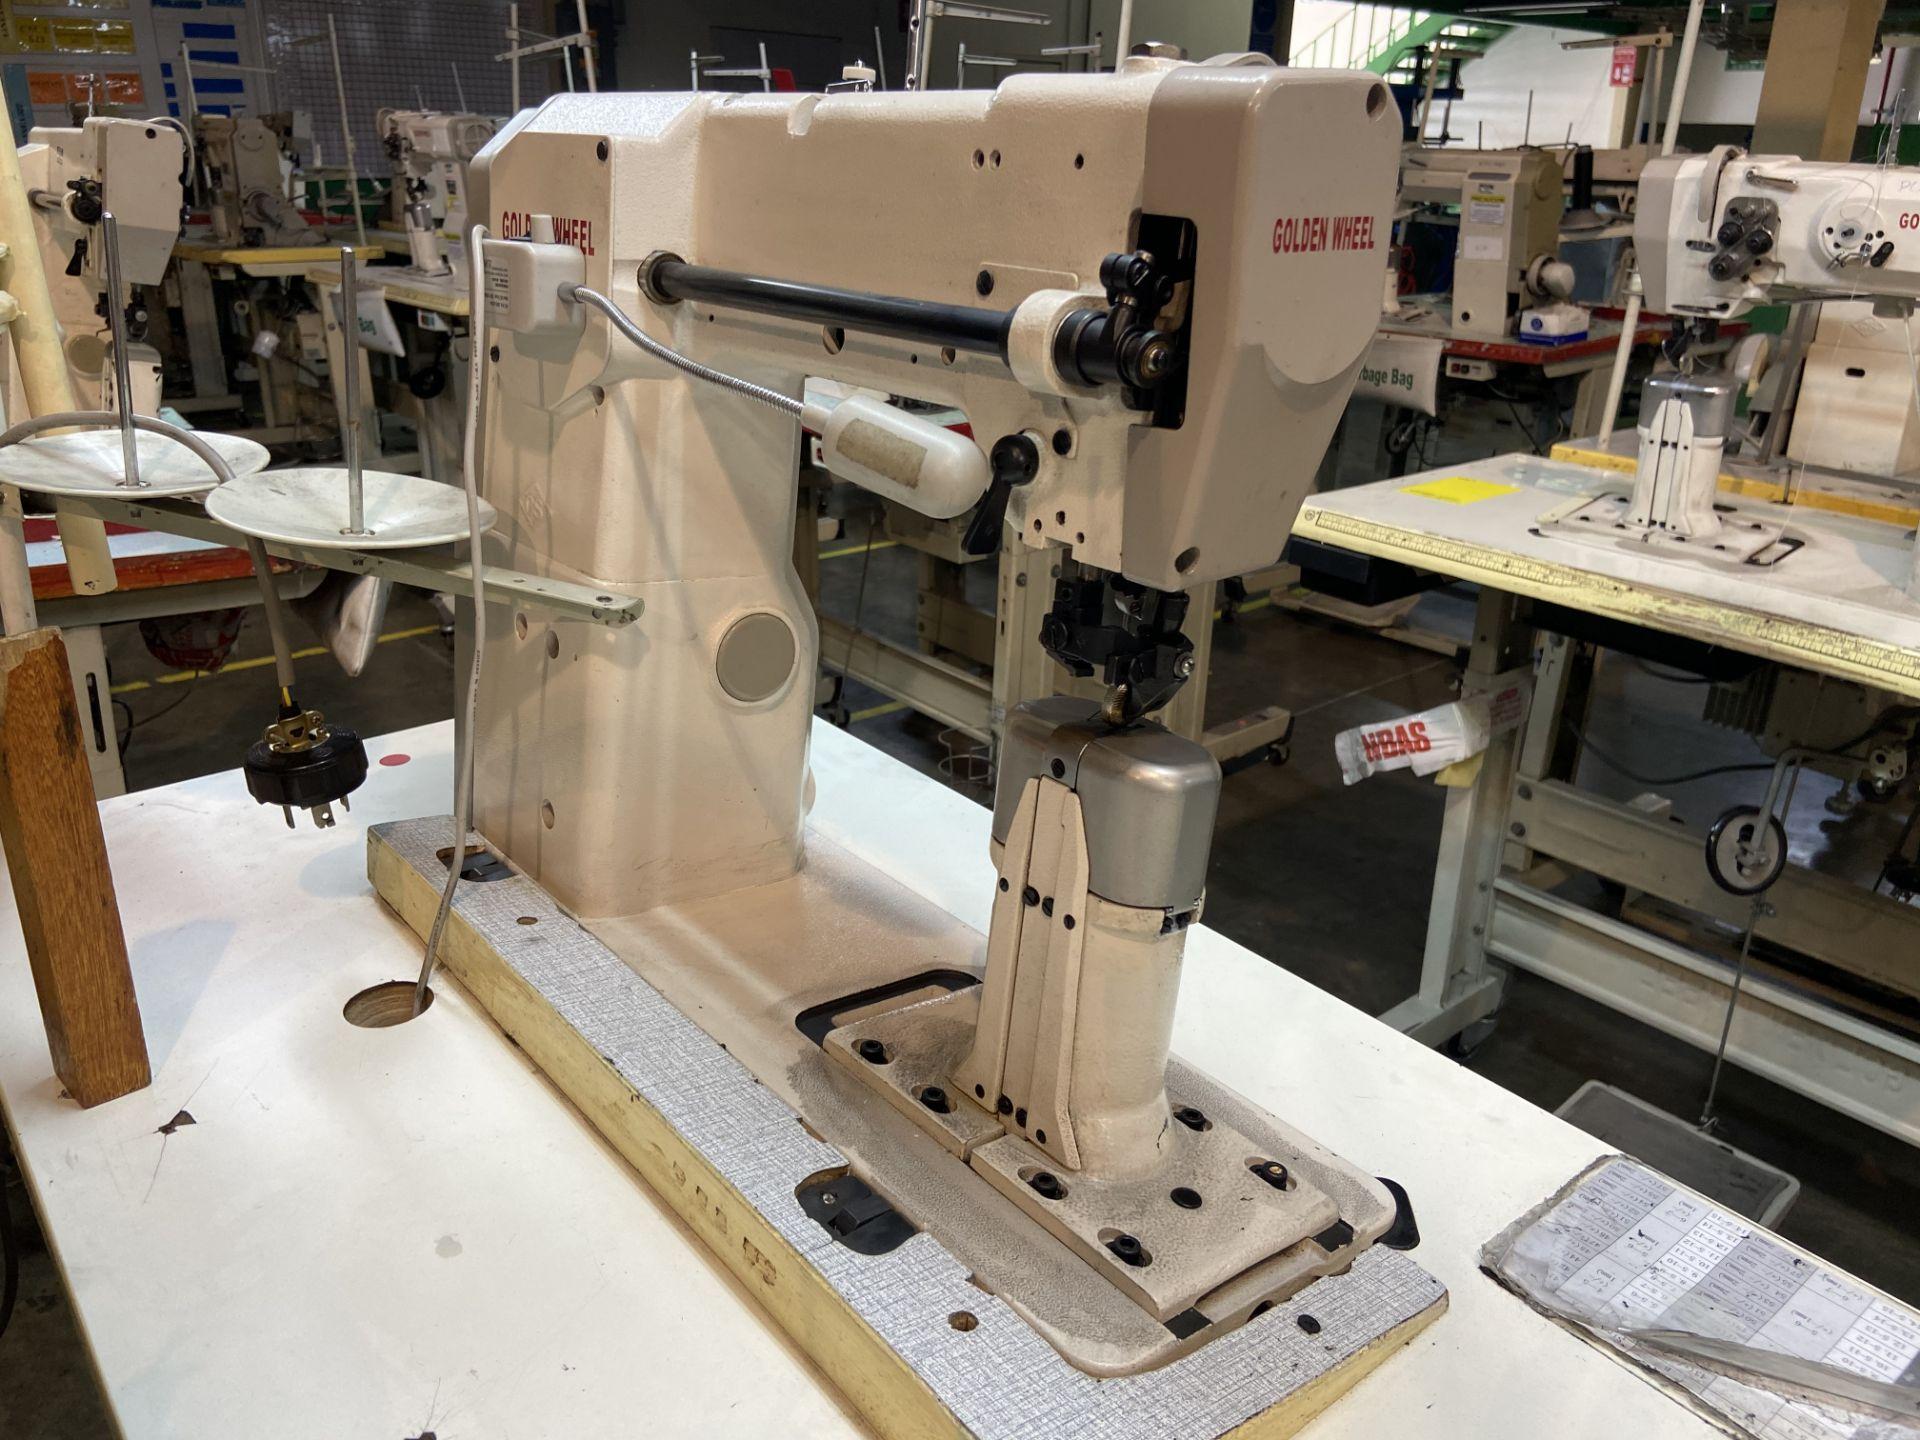 Lot 4 - (2) Máquinas de costura marca Golden Wheel de una aguja.